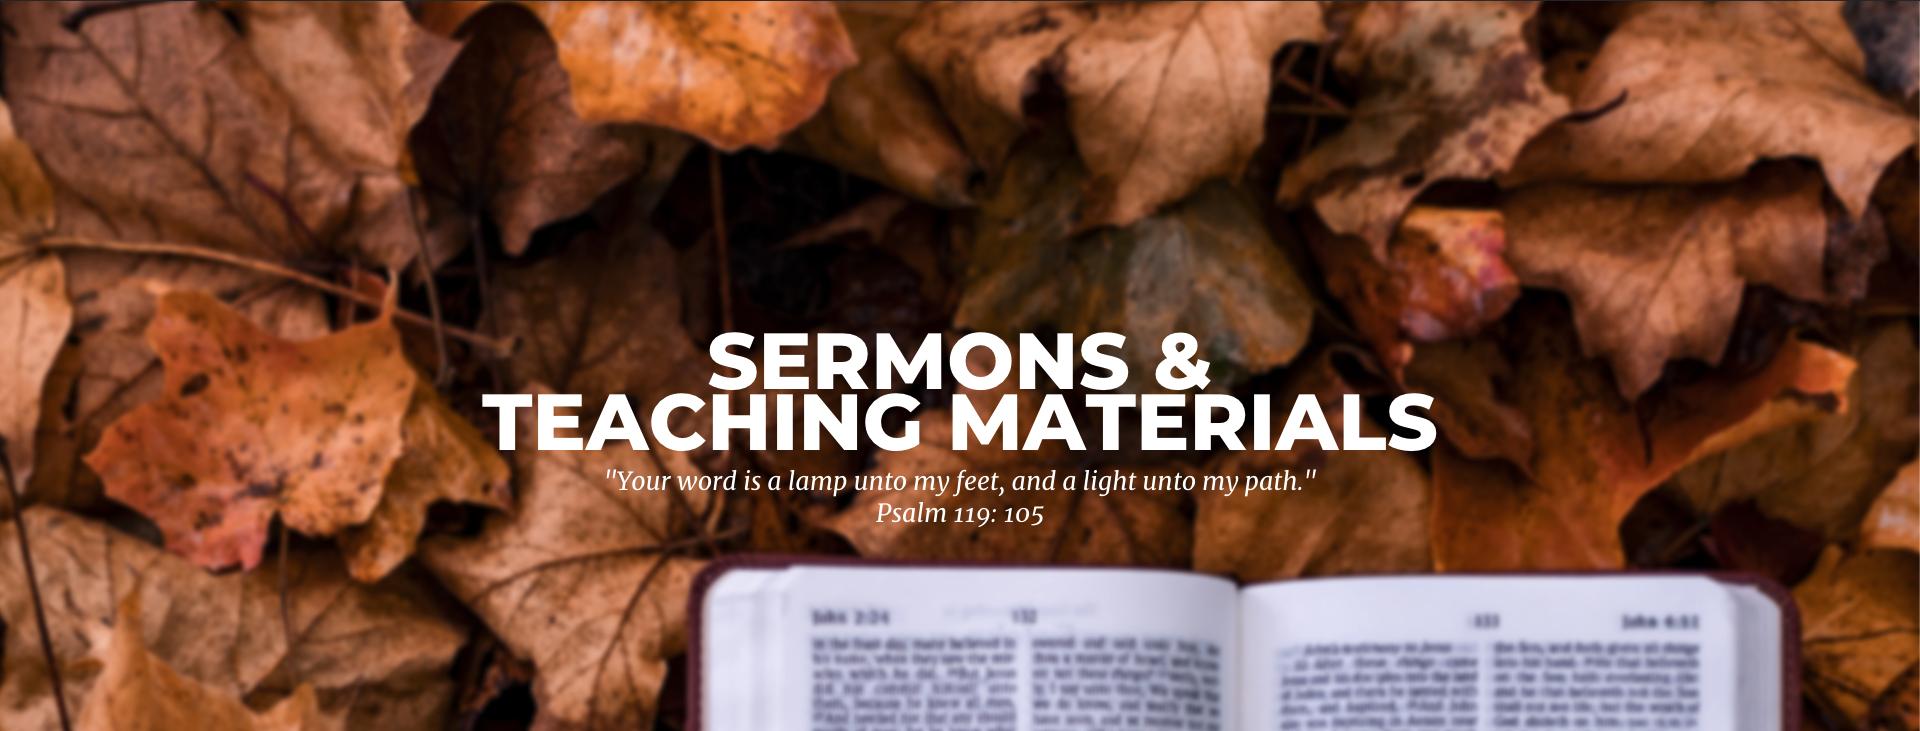 Sermons and Teaching Materials — United Pentecostal Church GB&I